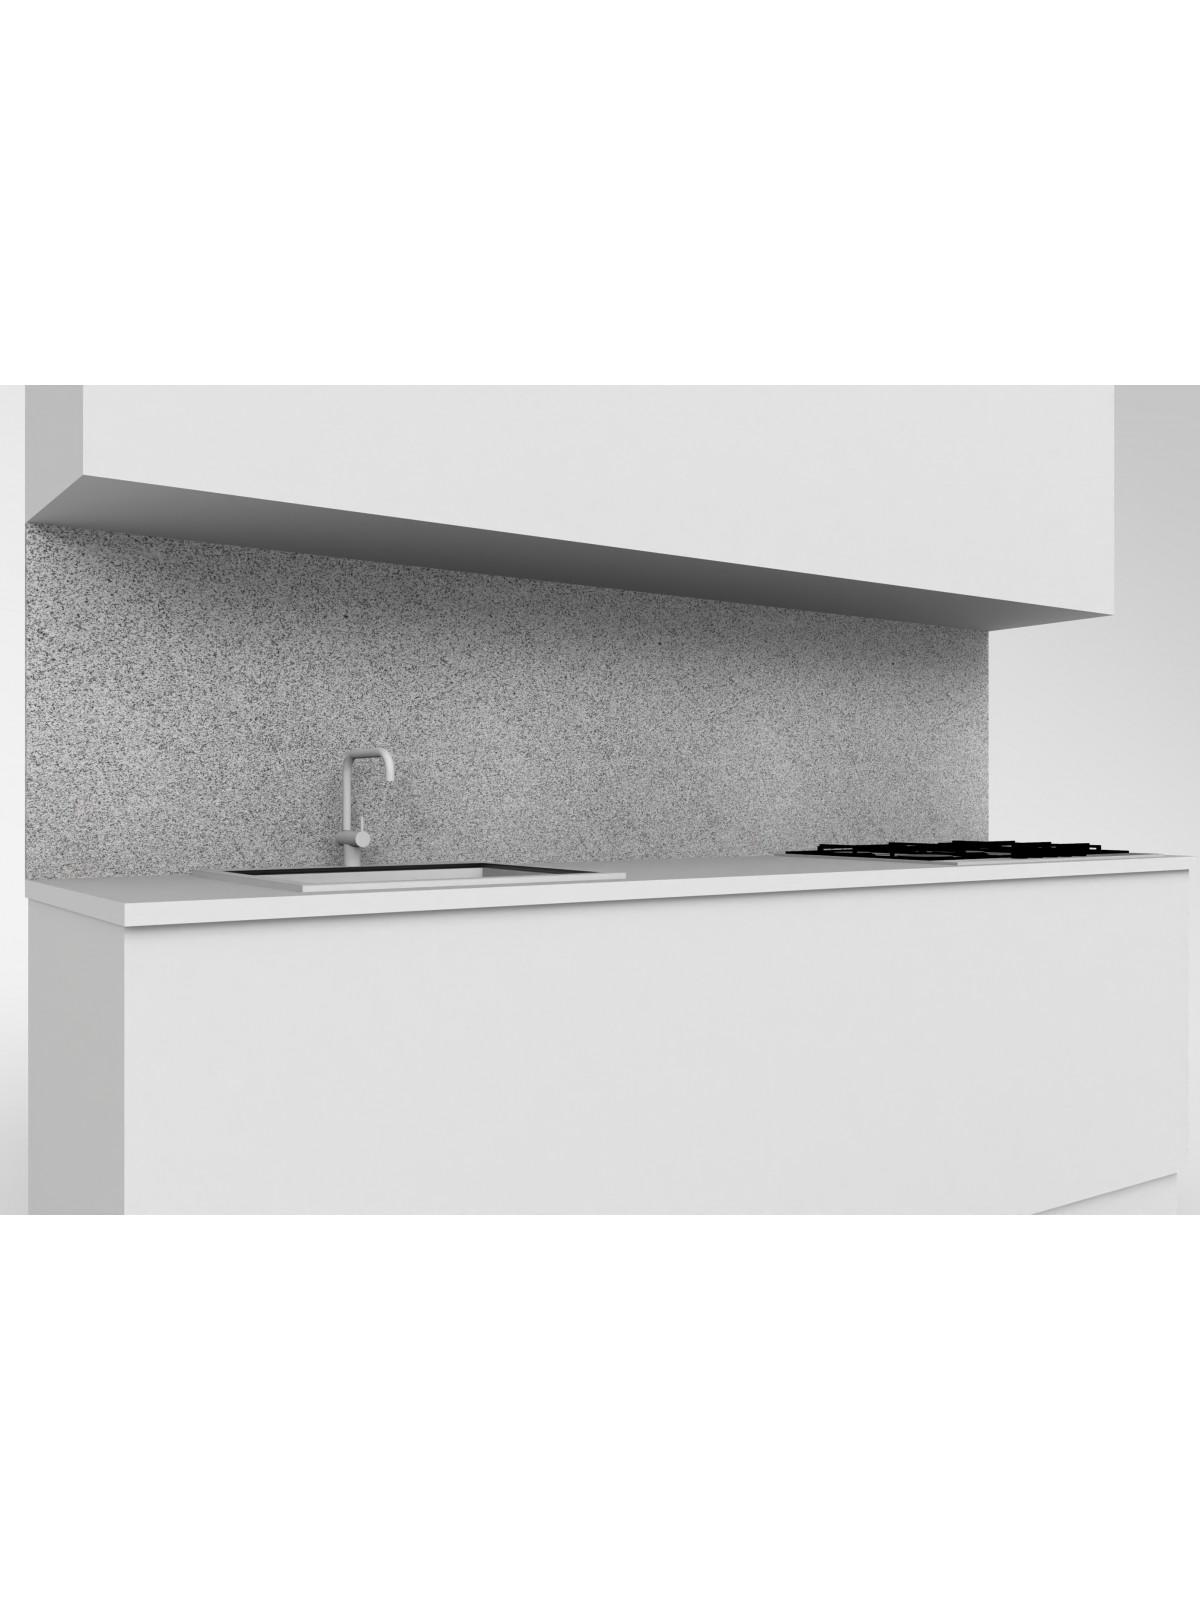 Erhöhte obere mobile Küche in Diorit Granit Klar